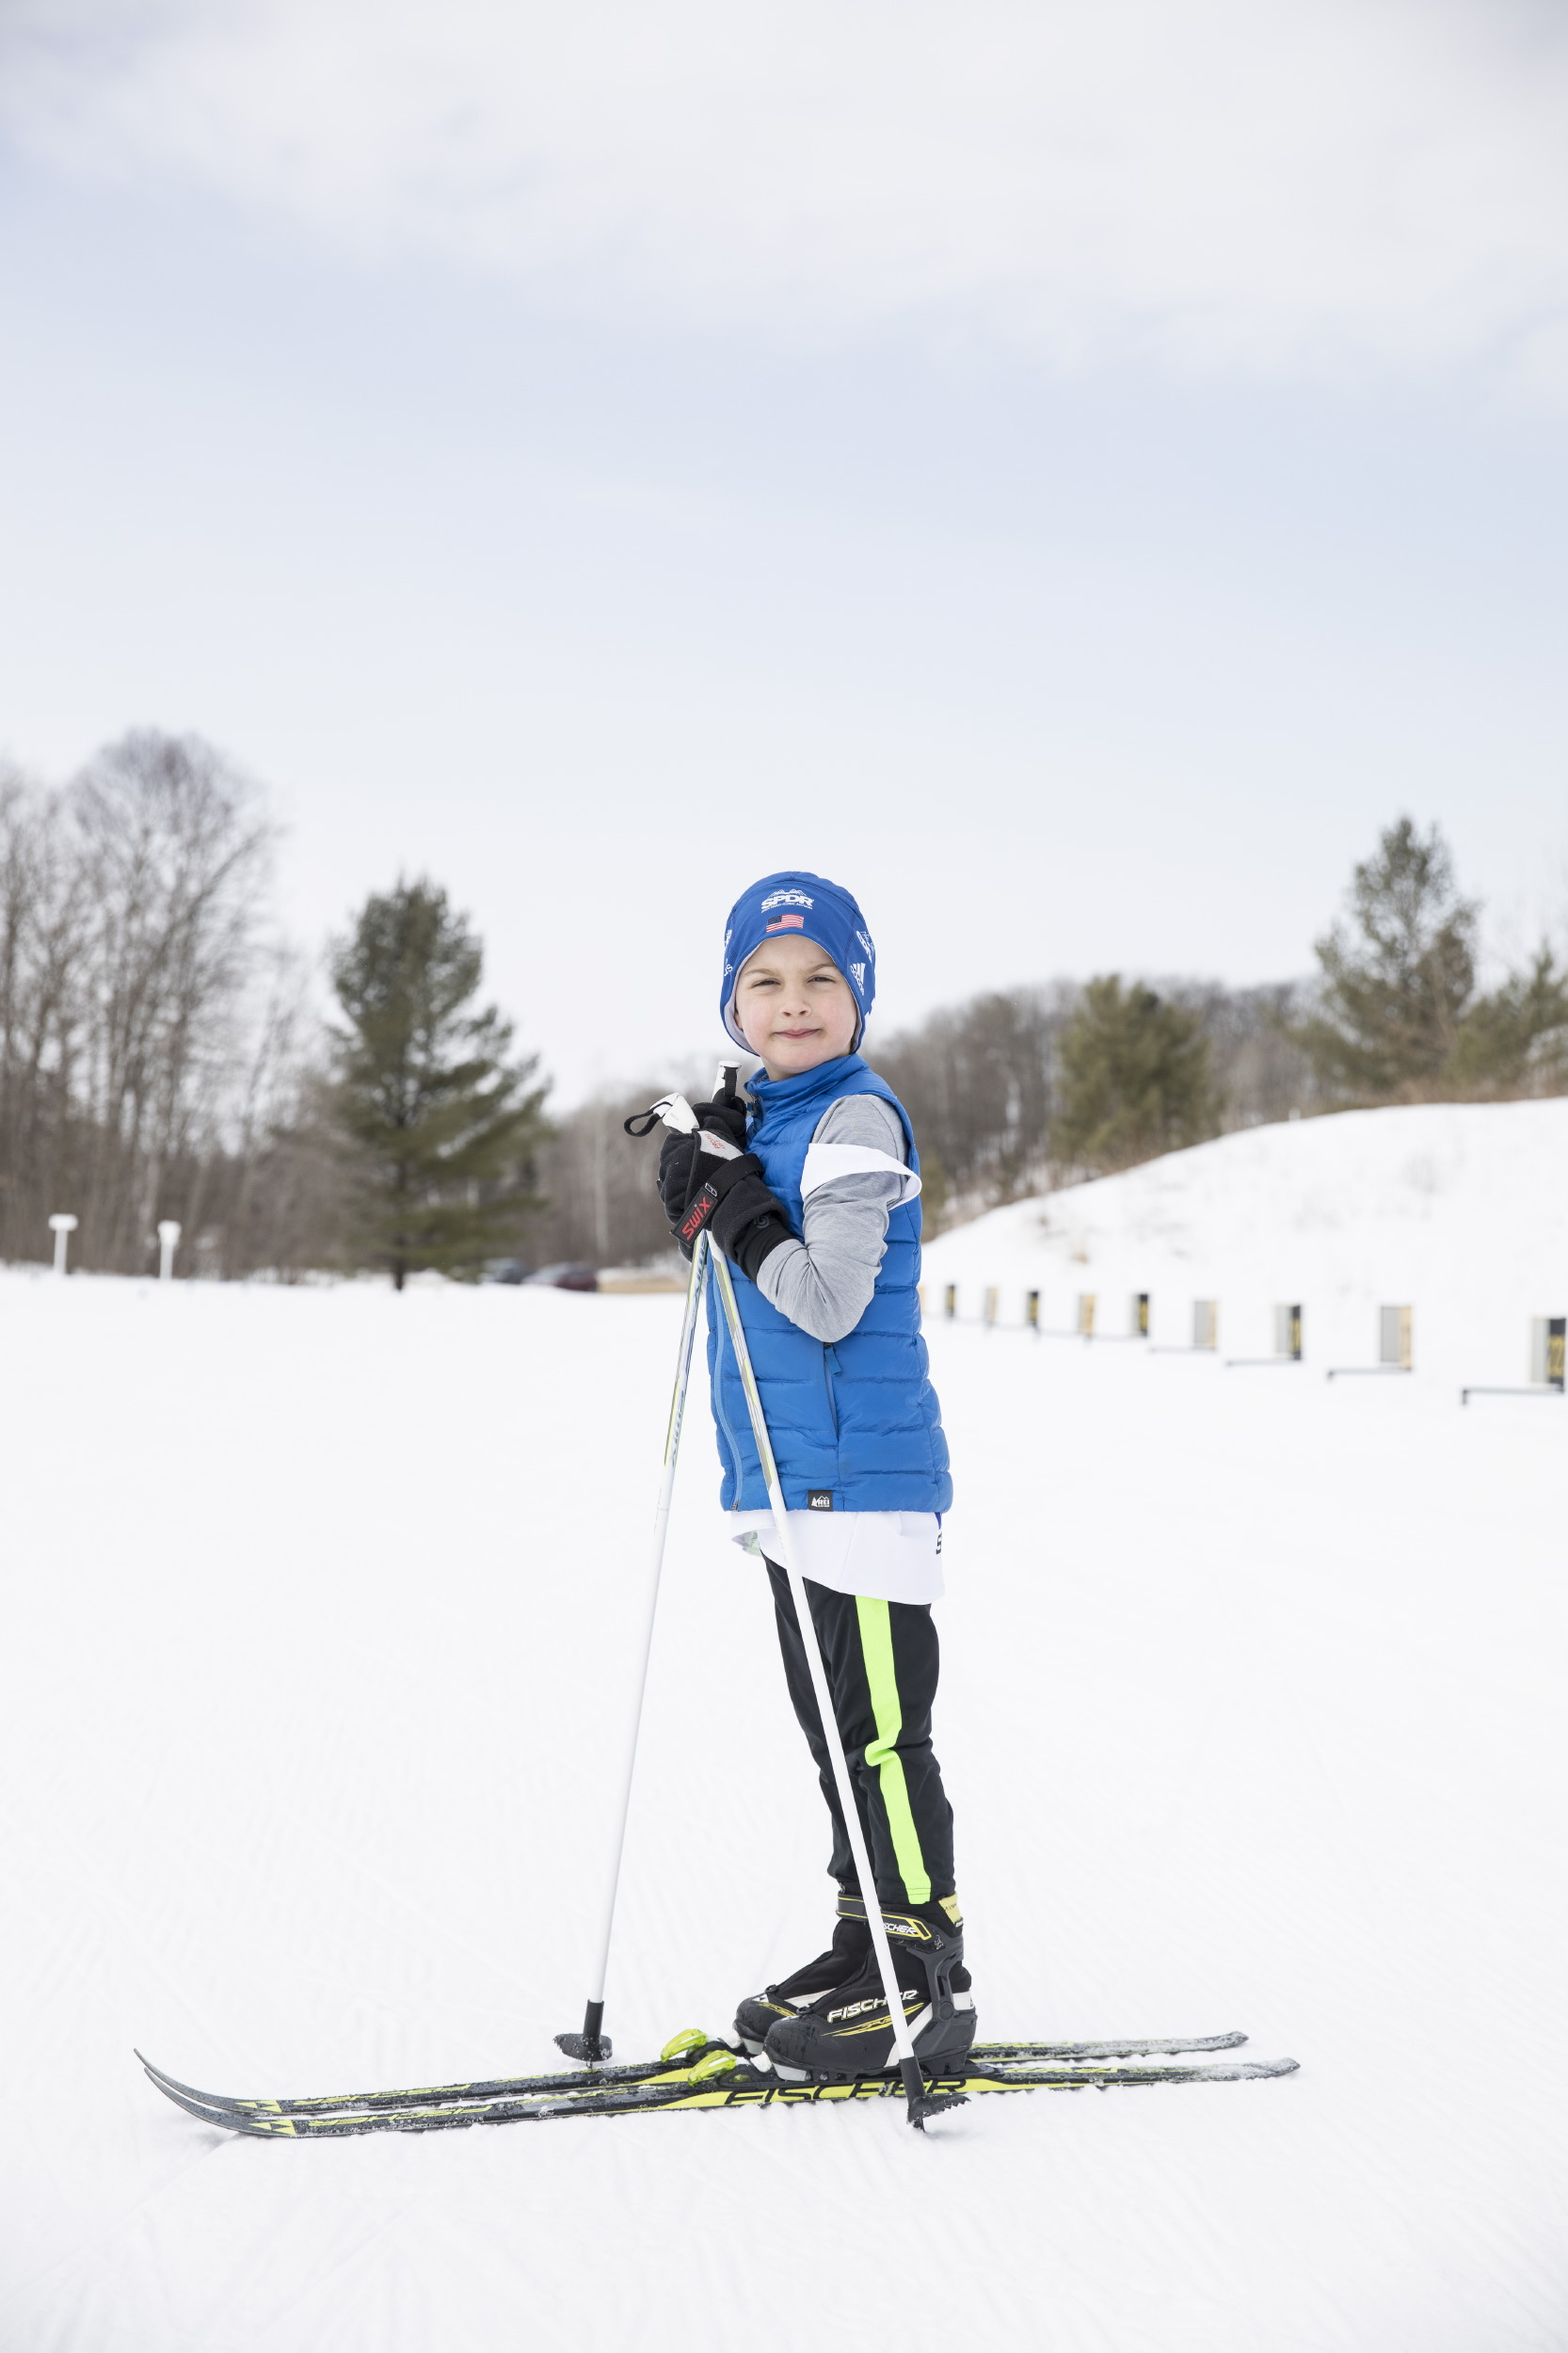 AckermanGruber_Skiing_10.JPG